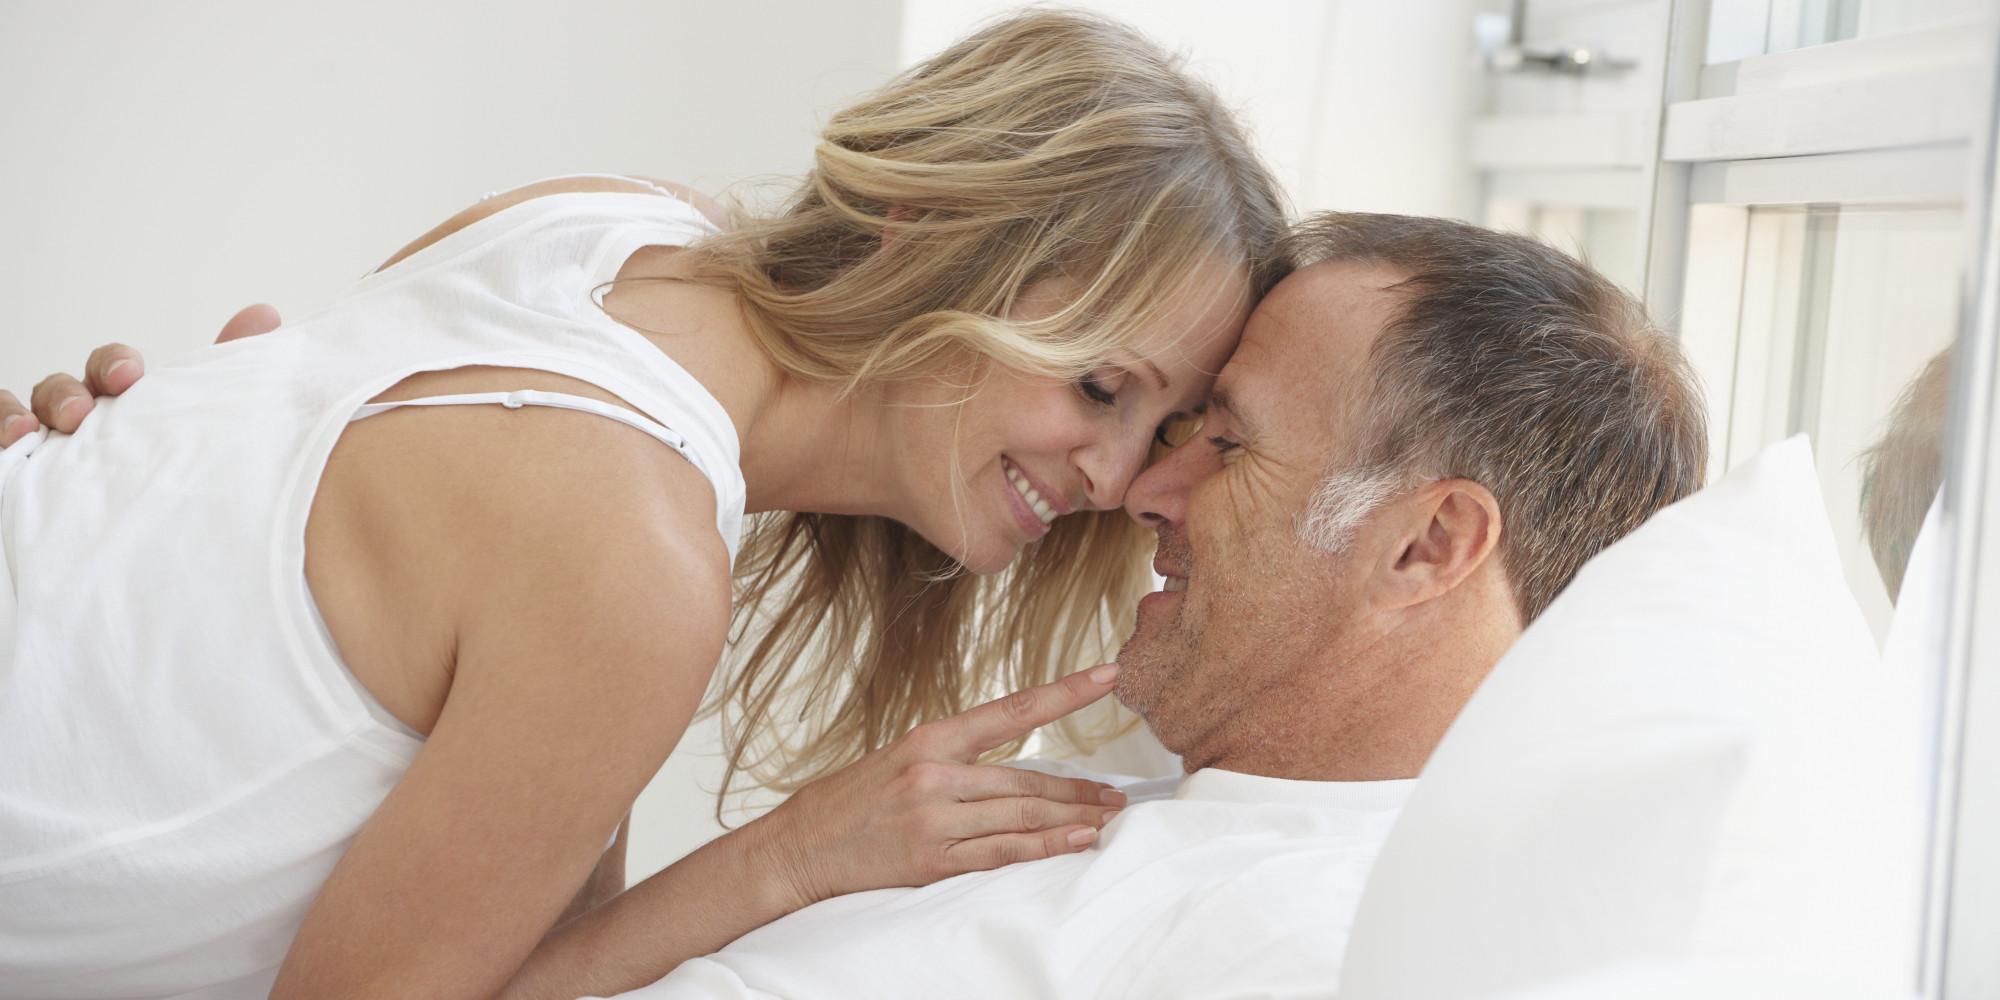 https://i2.wp.com/i.huffpost.com/gen/1717502/images/o-MATURE-COUPLE-IN-BED-facebook.jpg